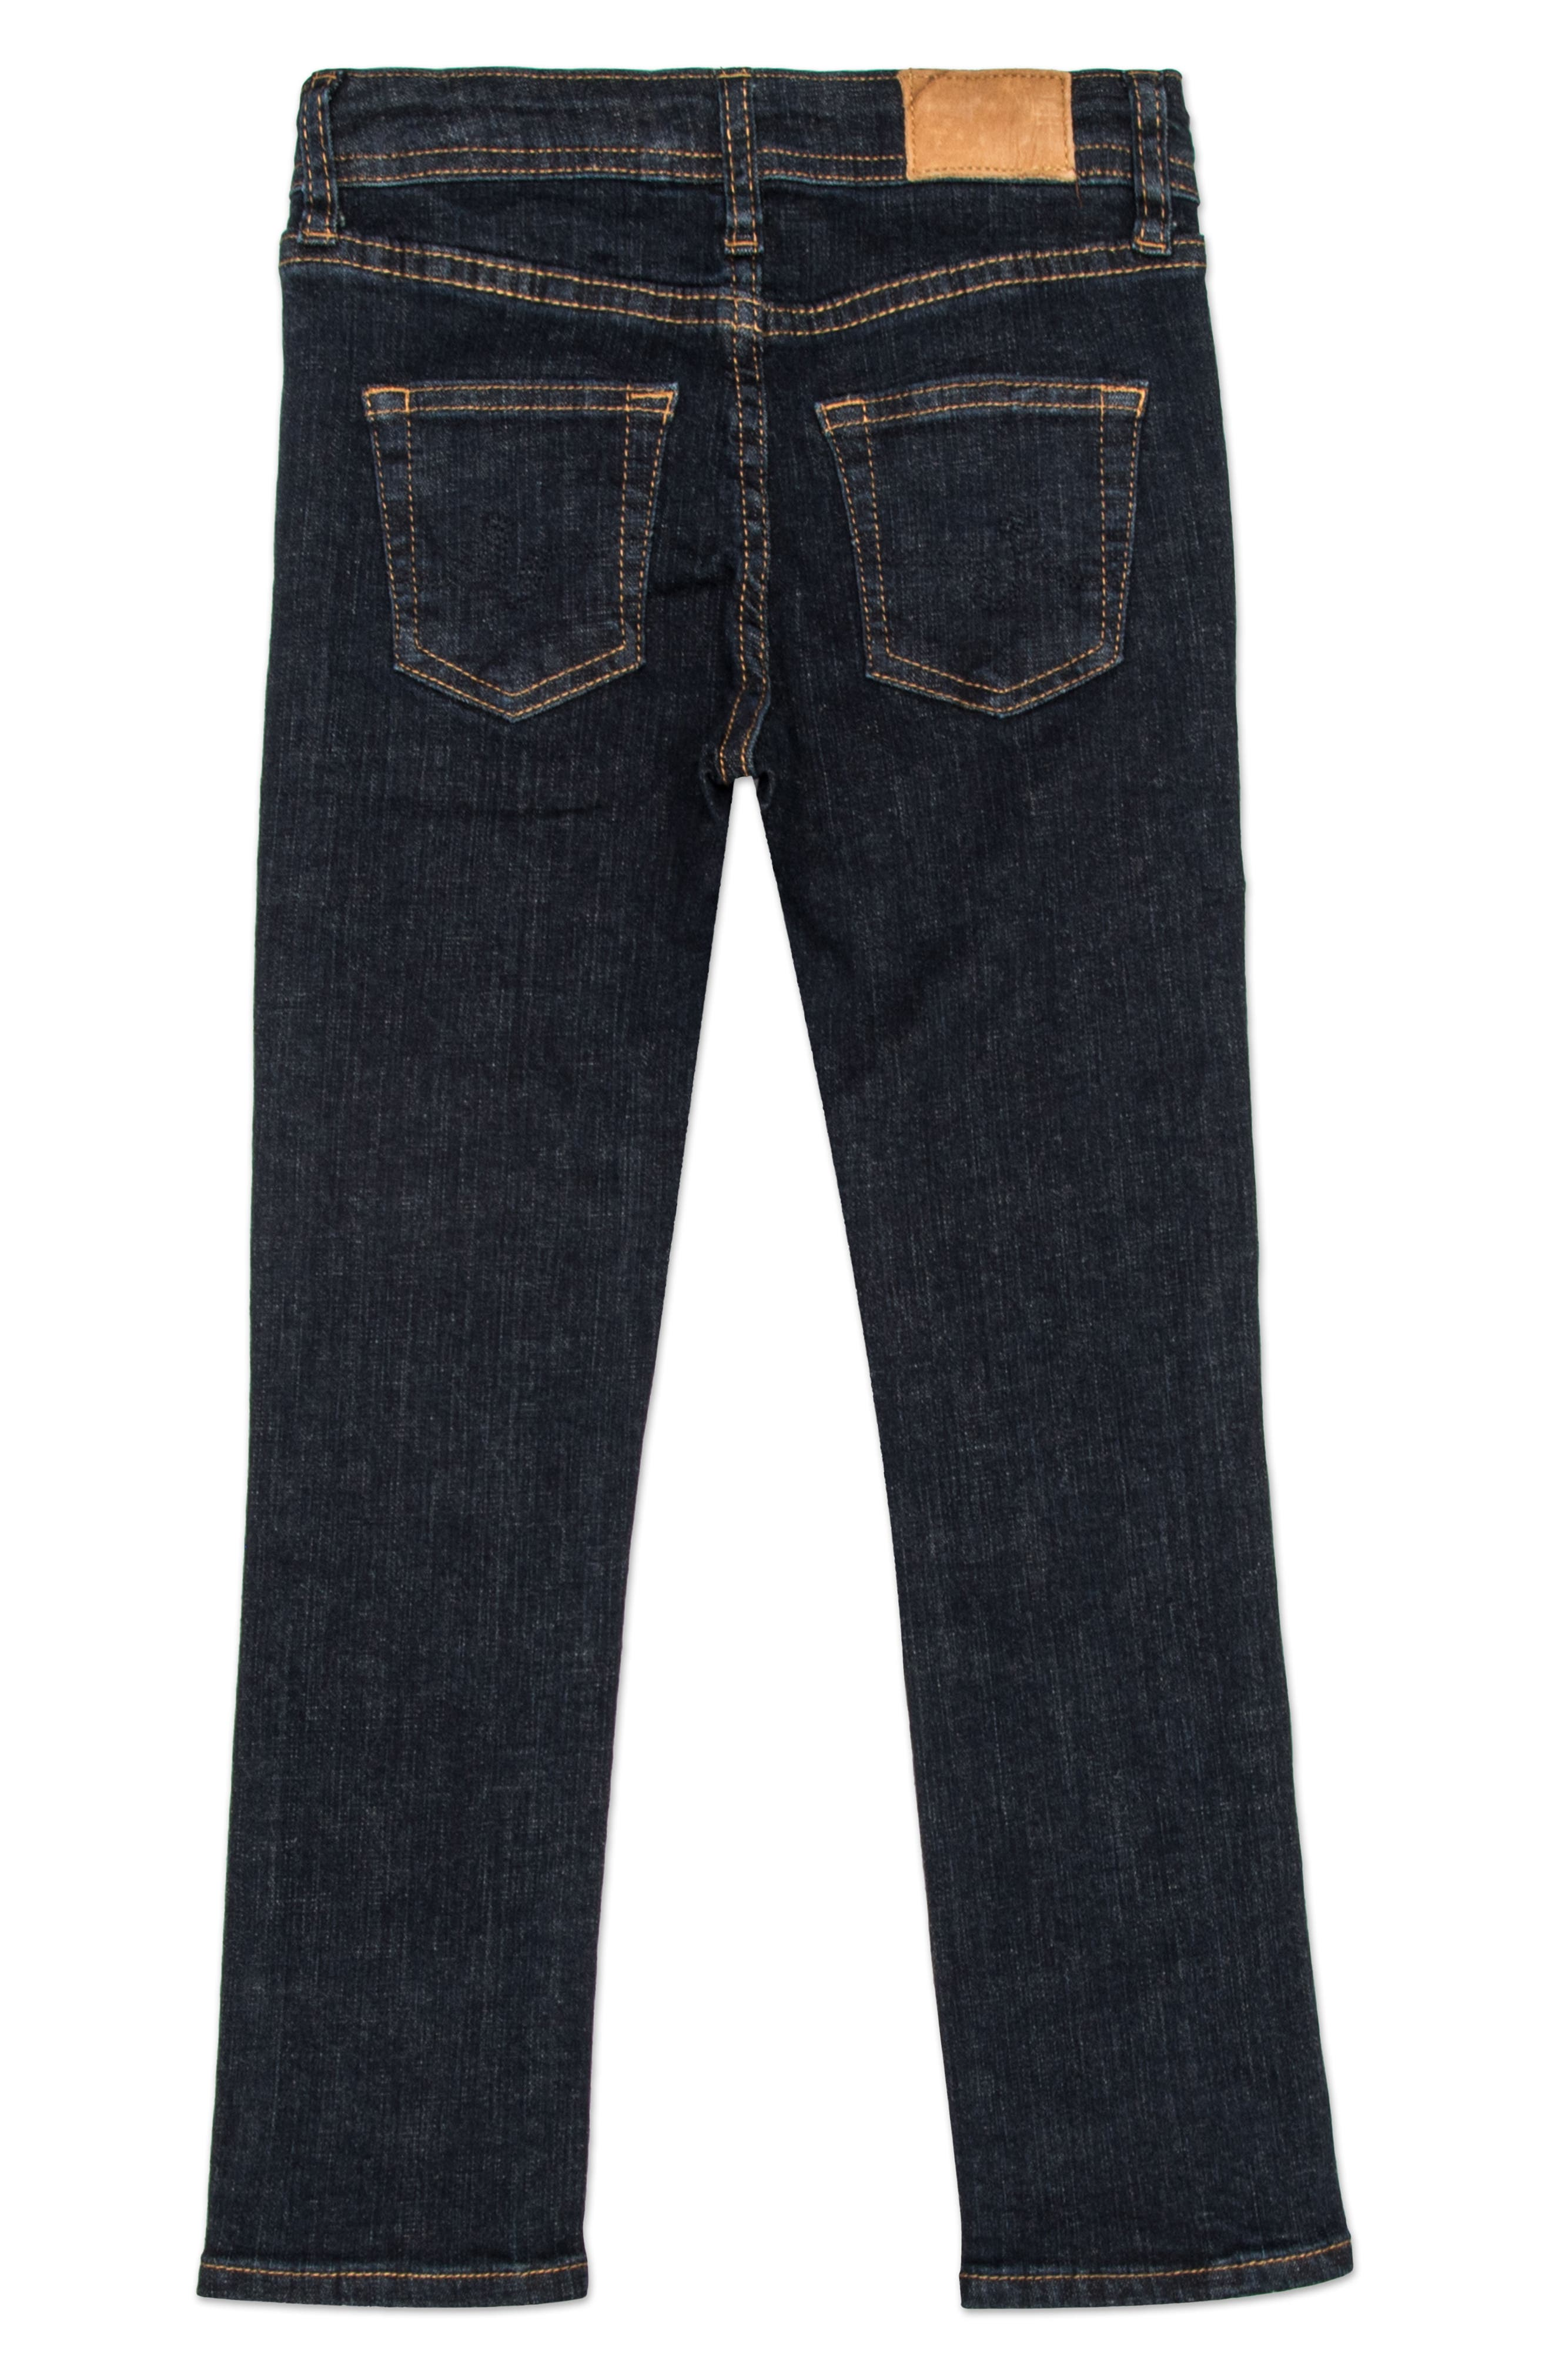 AG The Kingston Slim Jeans,                             Alternate thumbnail 2, color,                             413